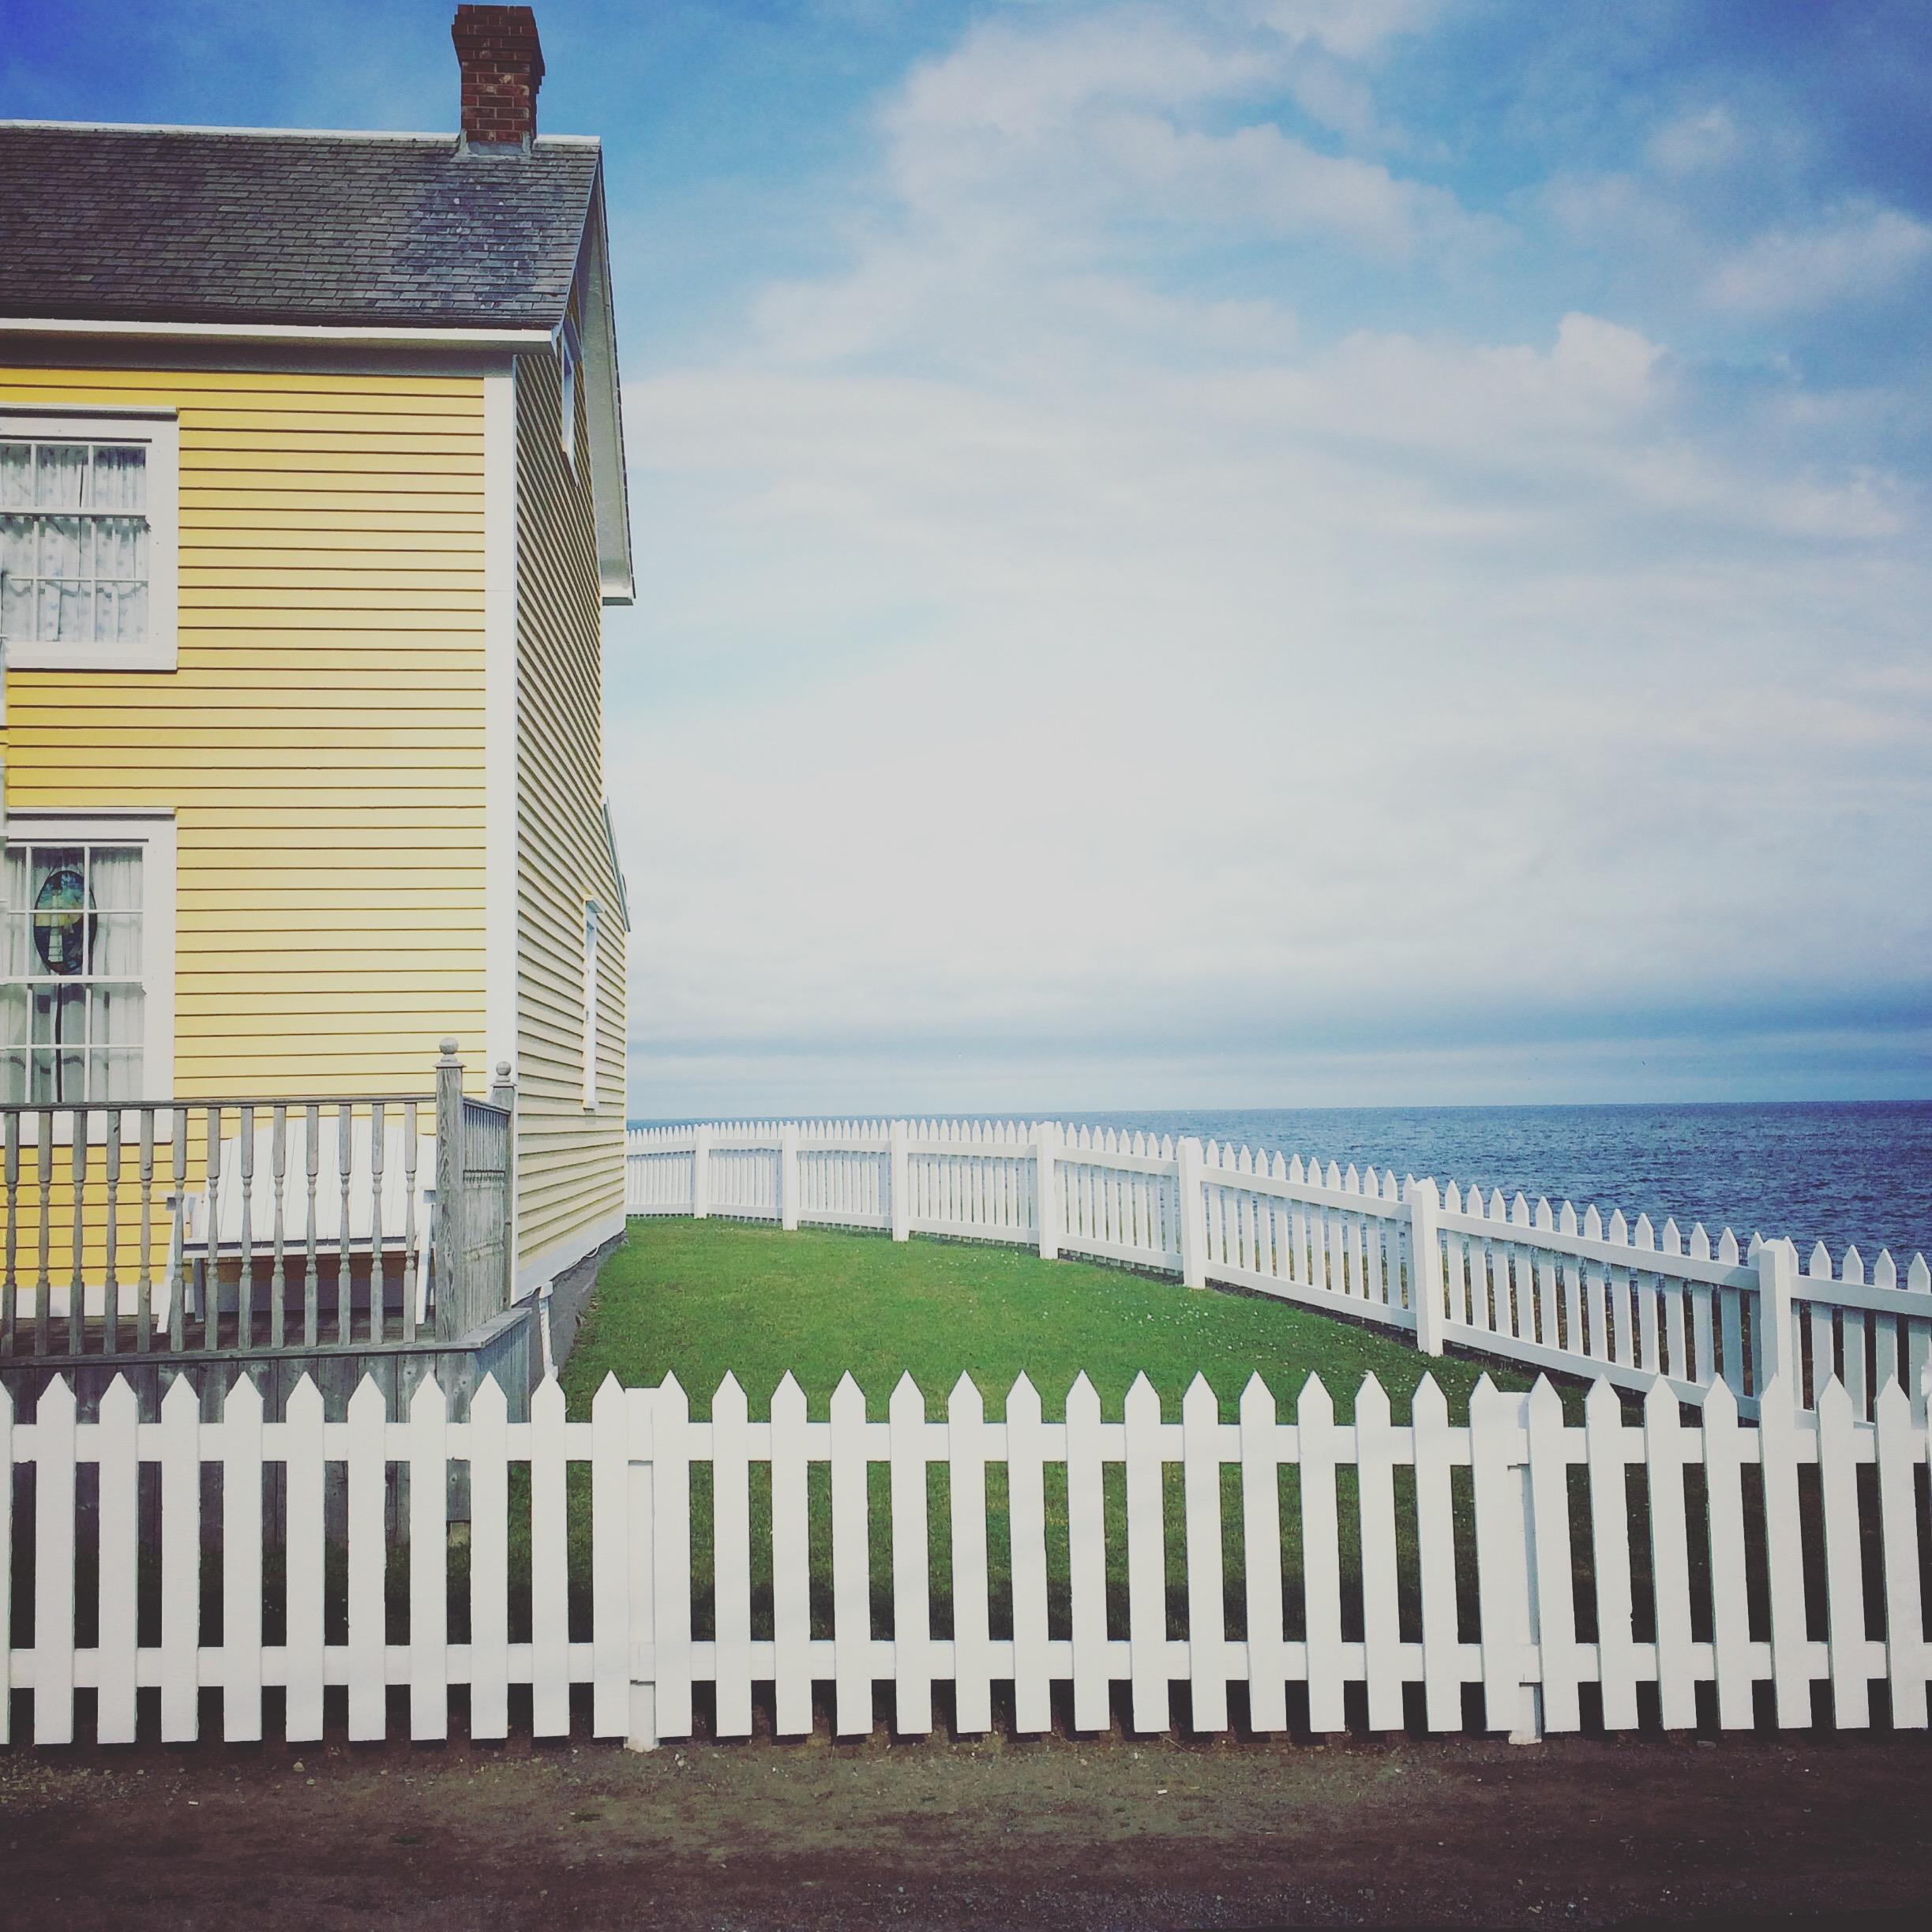 Bonavista, Newfoundland   iPhone5 photo   © 2016 Bojan Fürst